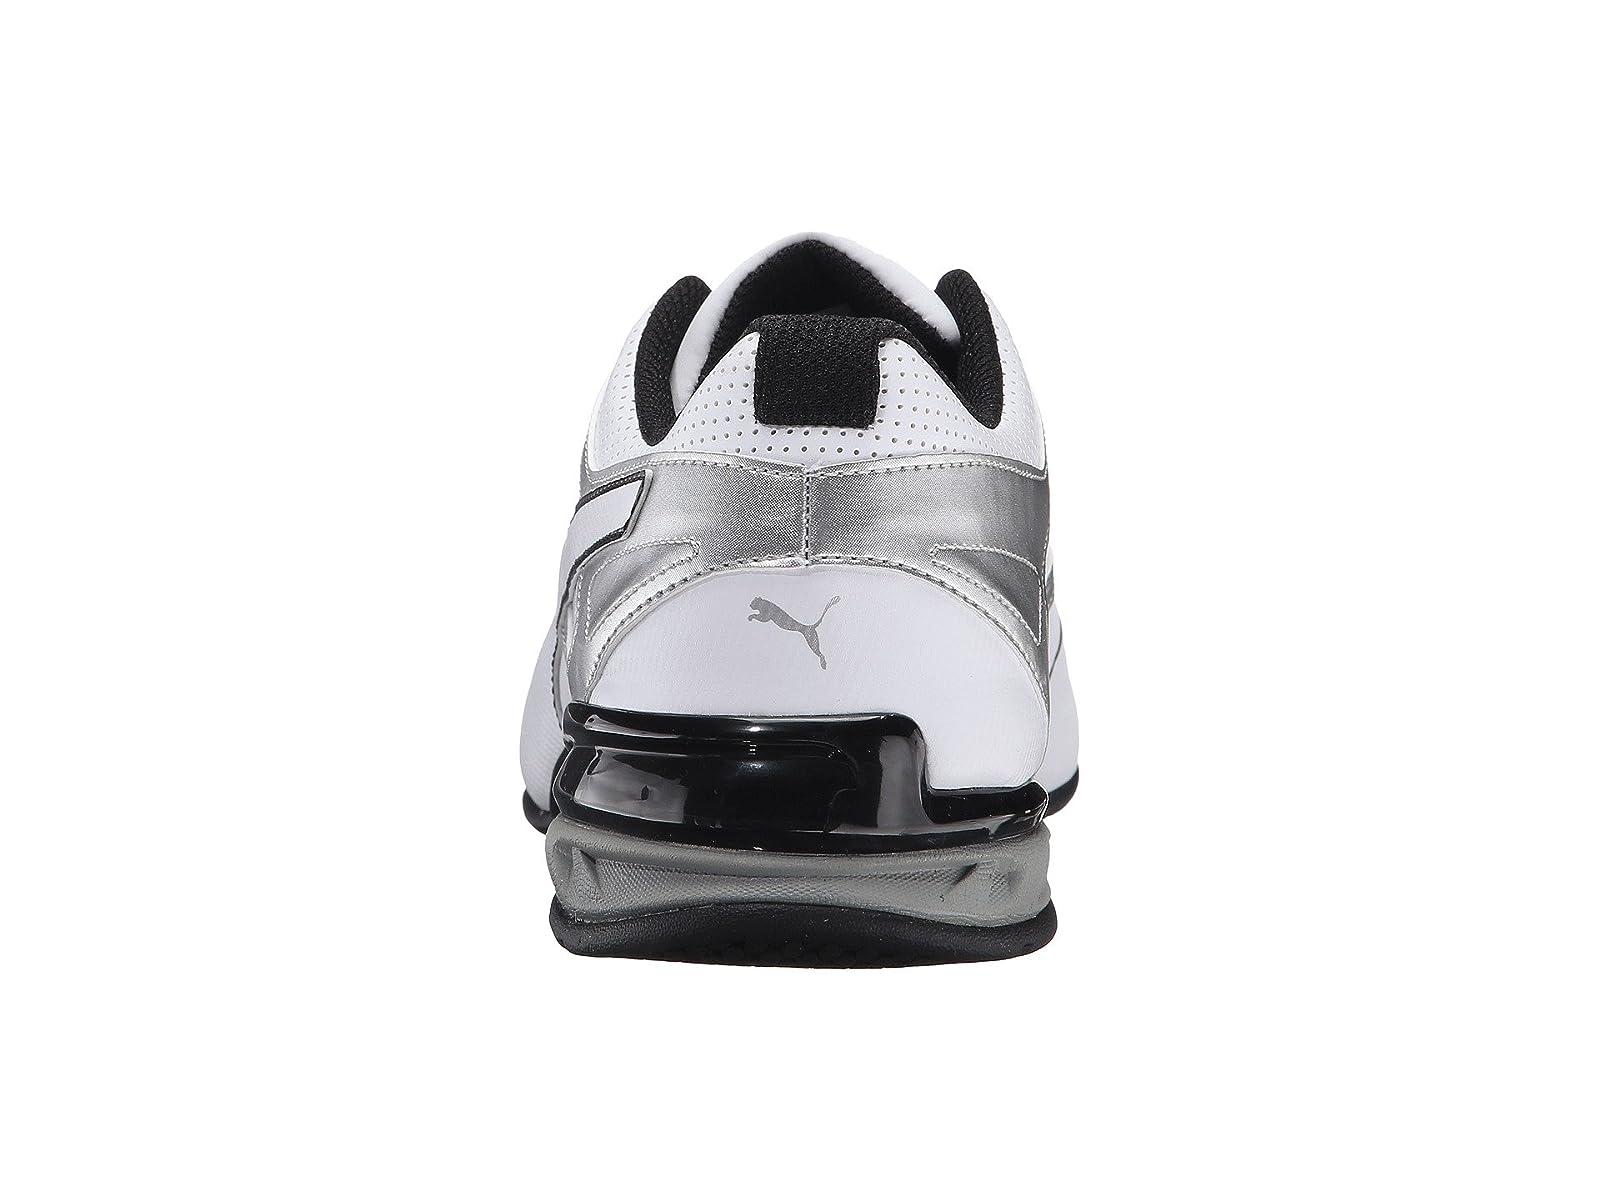 Men-039-s-Scarpe-Da-Ginnastica-amp-Athletic-Shoes-Puma-Tazon-6-FM miniatura 27